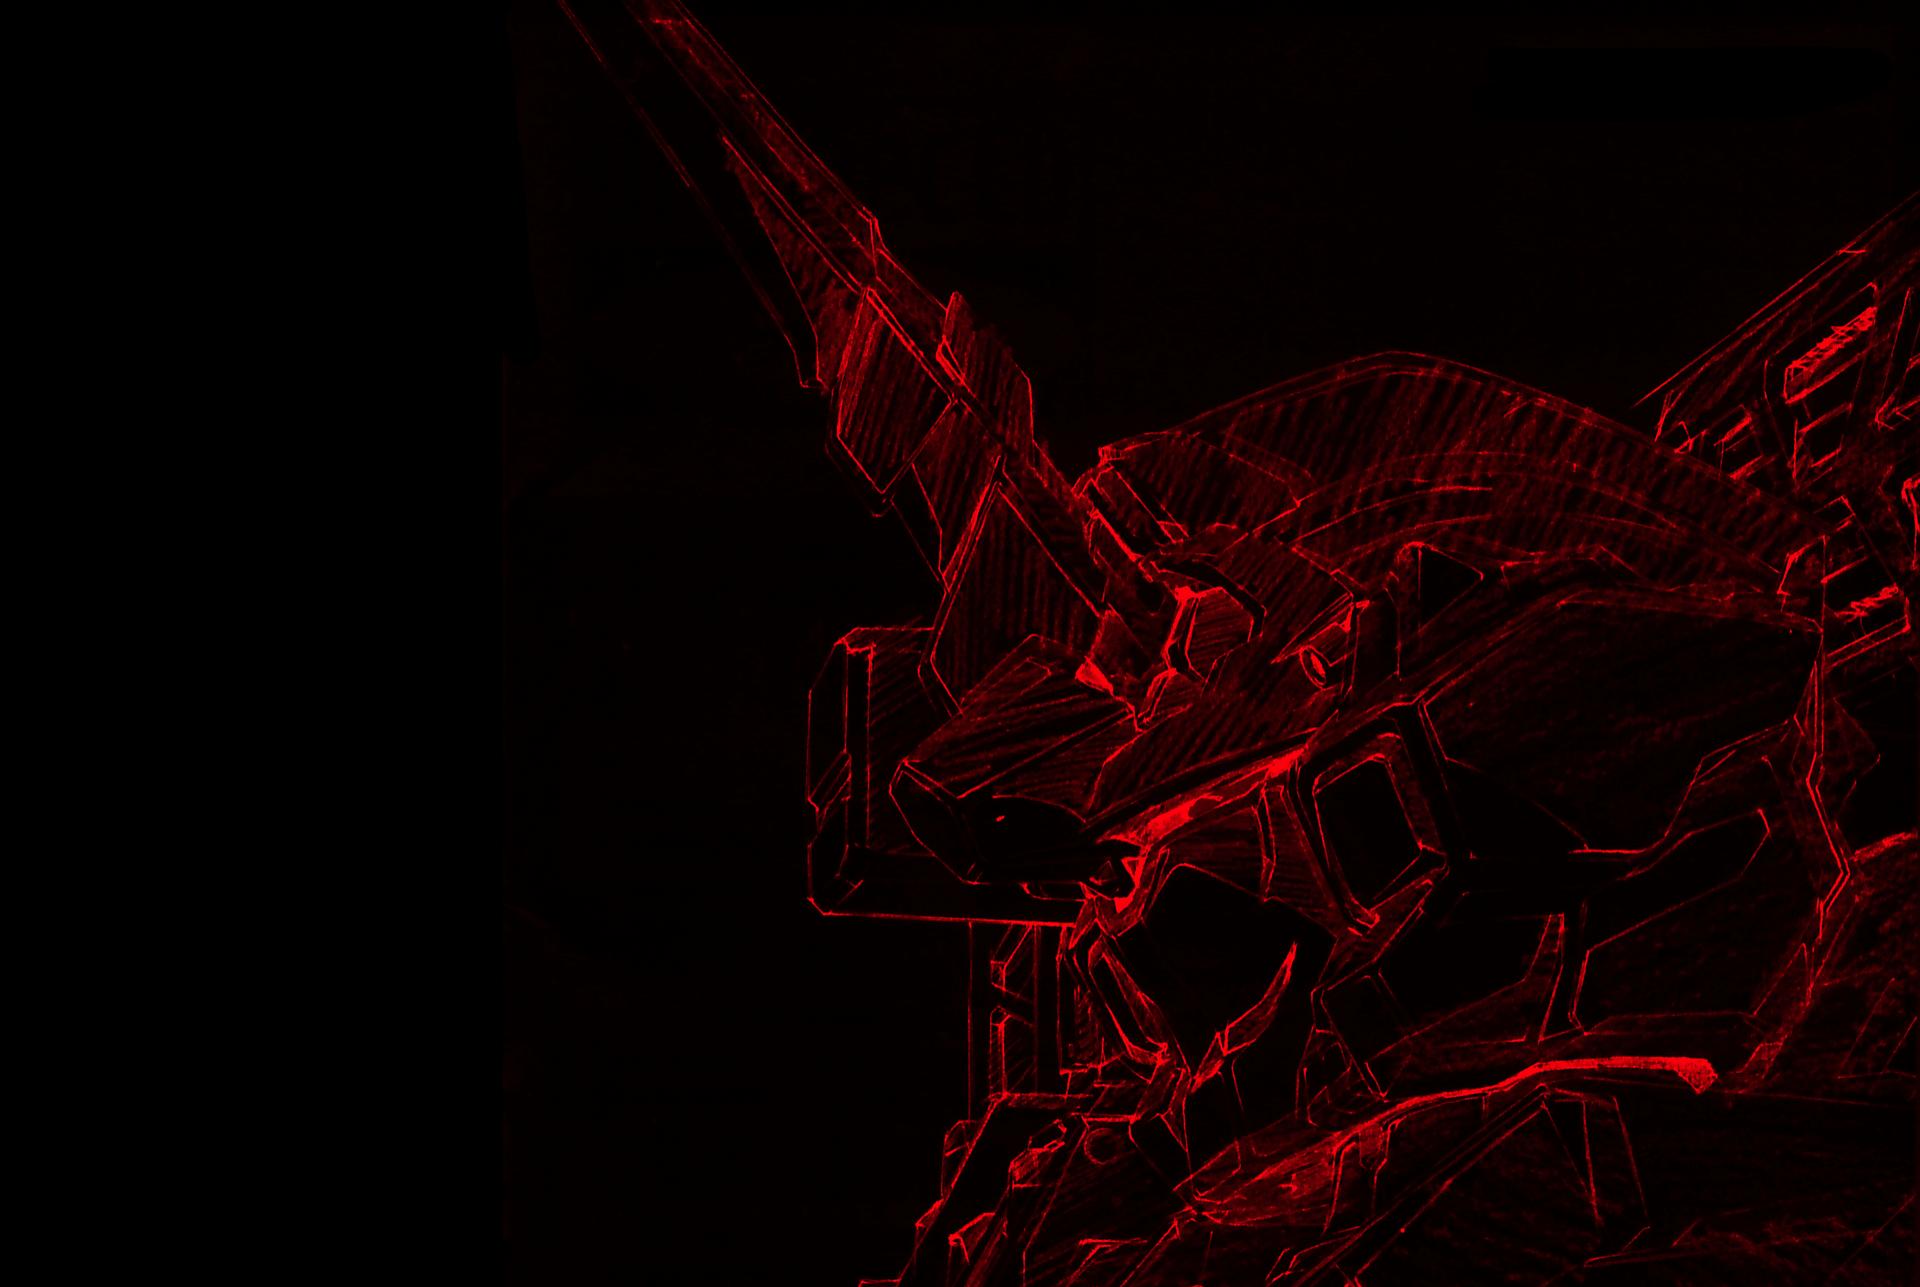 Anime 1920x1287 Gundam anime Mobile Suit Gundam Unicorn drawn